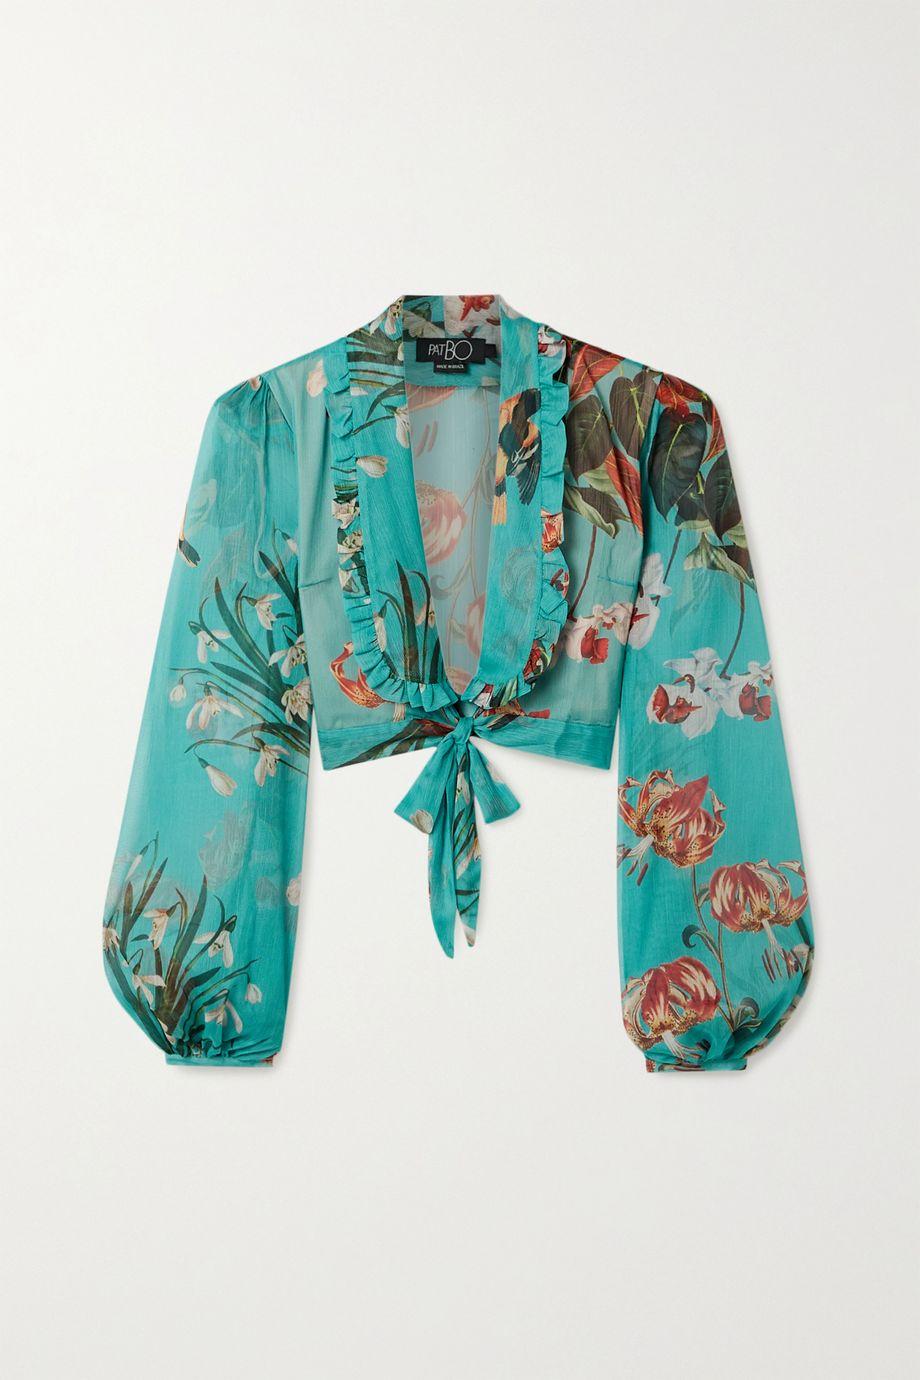 PatBO Carolina cropped tie-front floral-print chiffon top